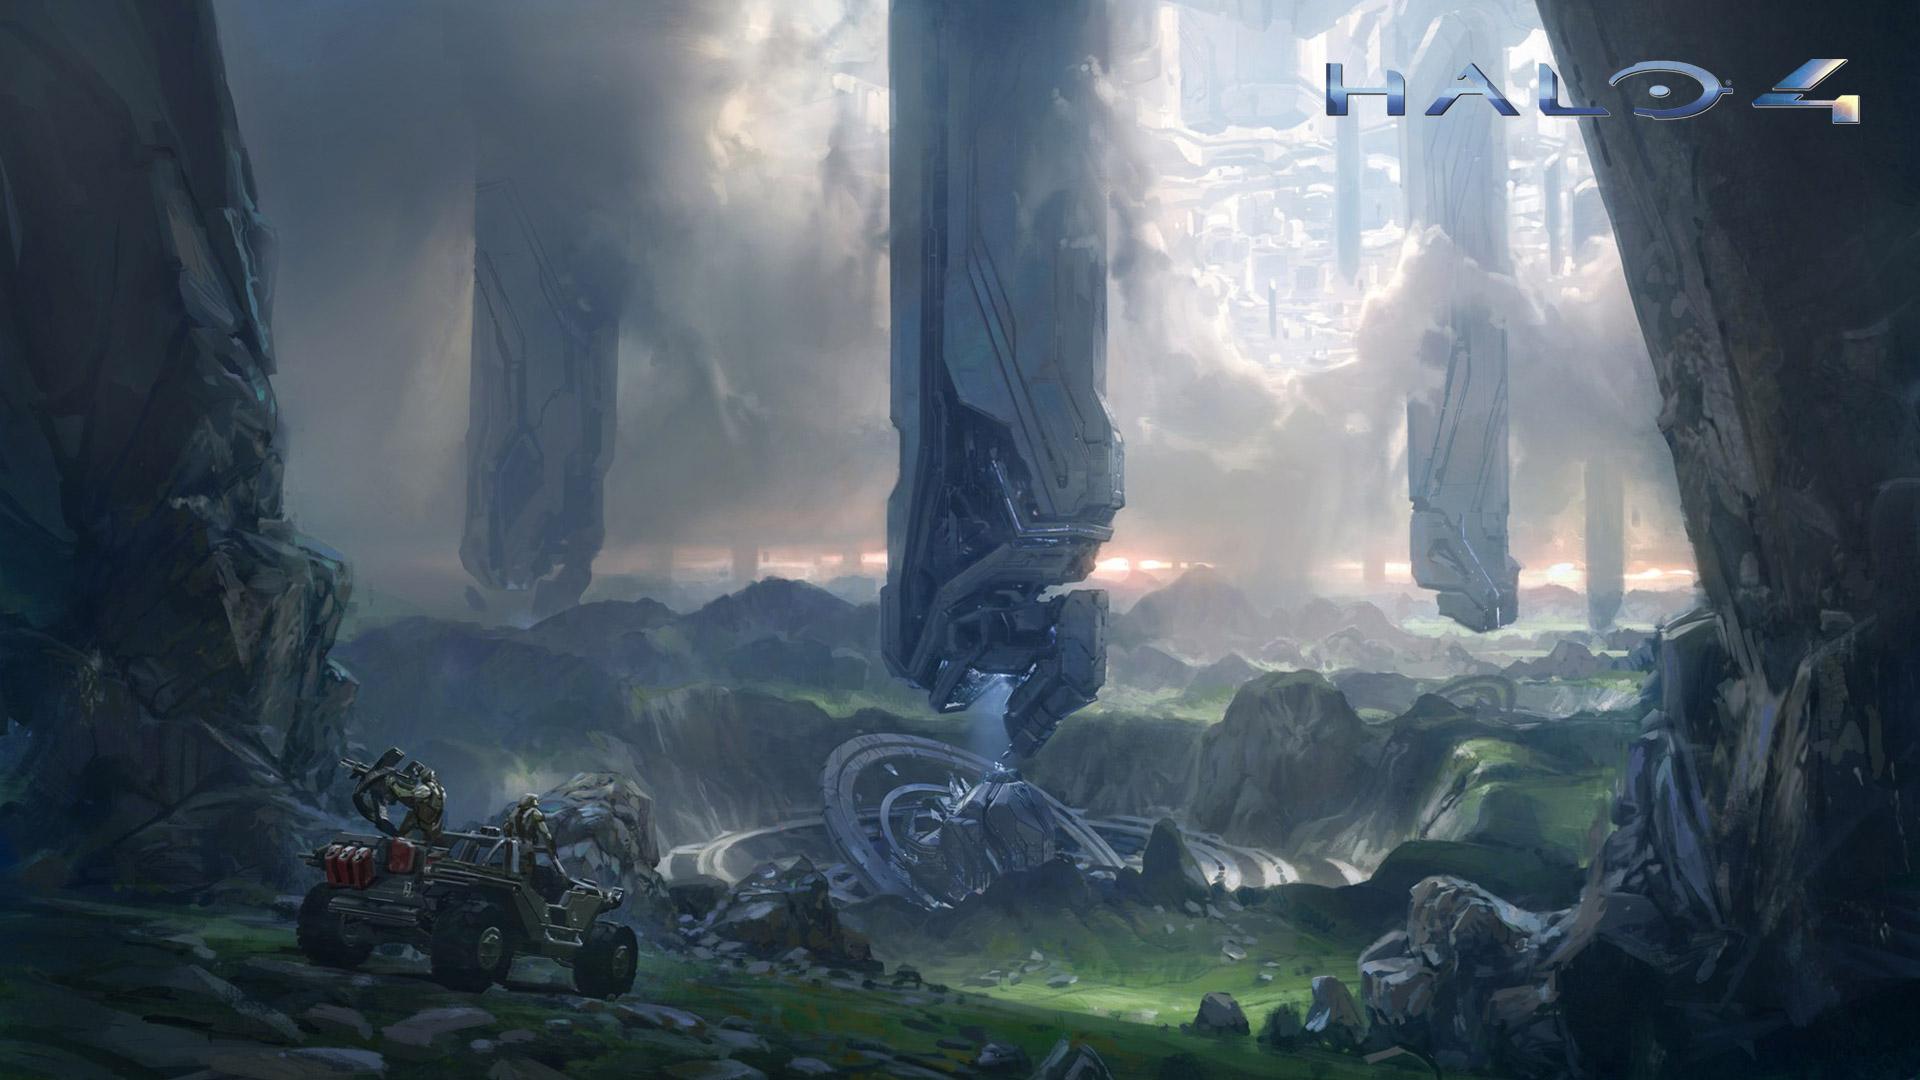 Halo 4 wallpaper 49